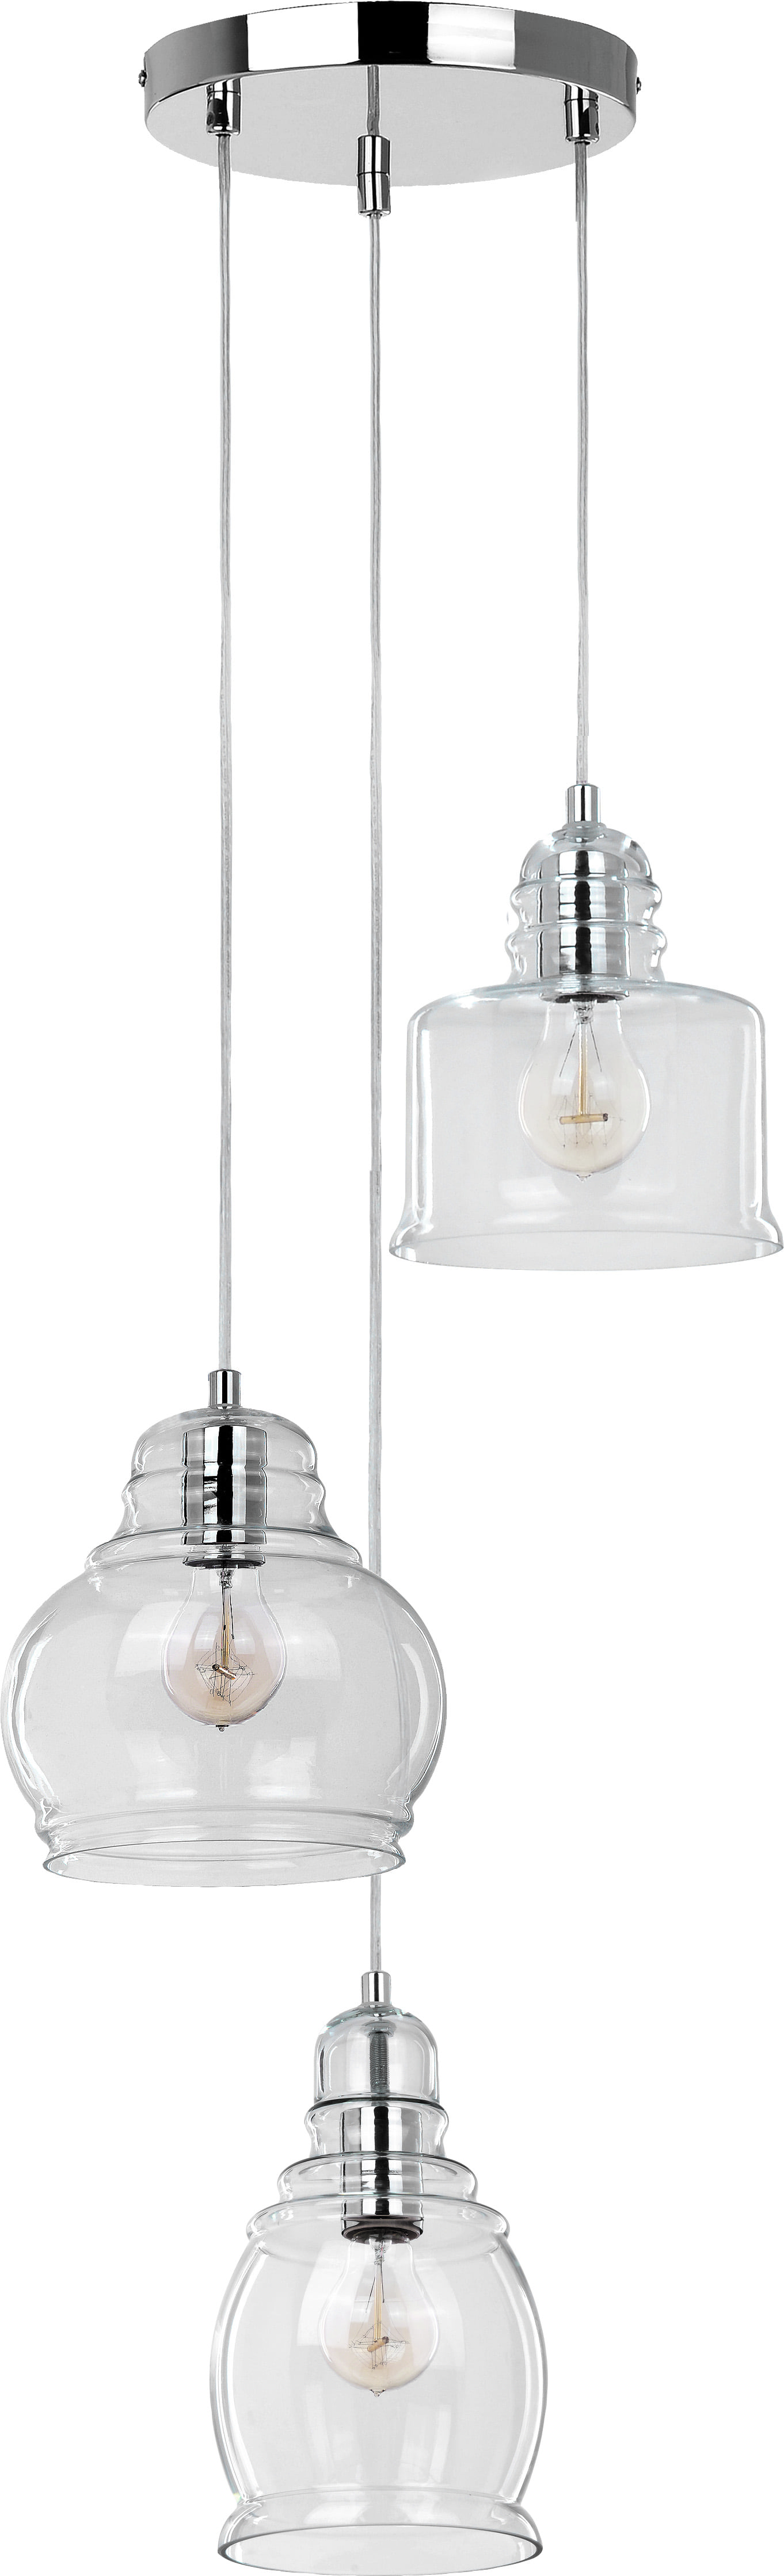 Lampa wisząca 3-punktowa Nova szklane klosze